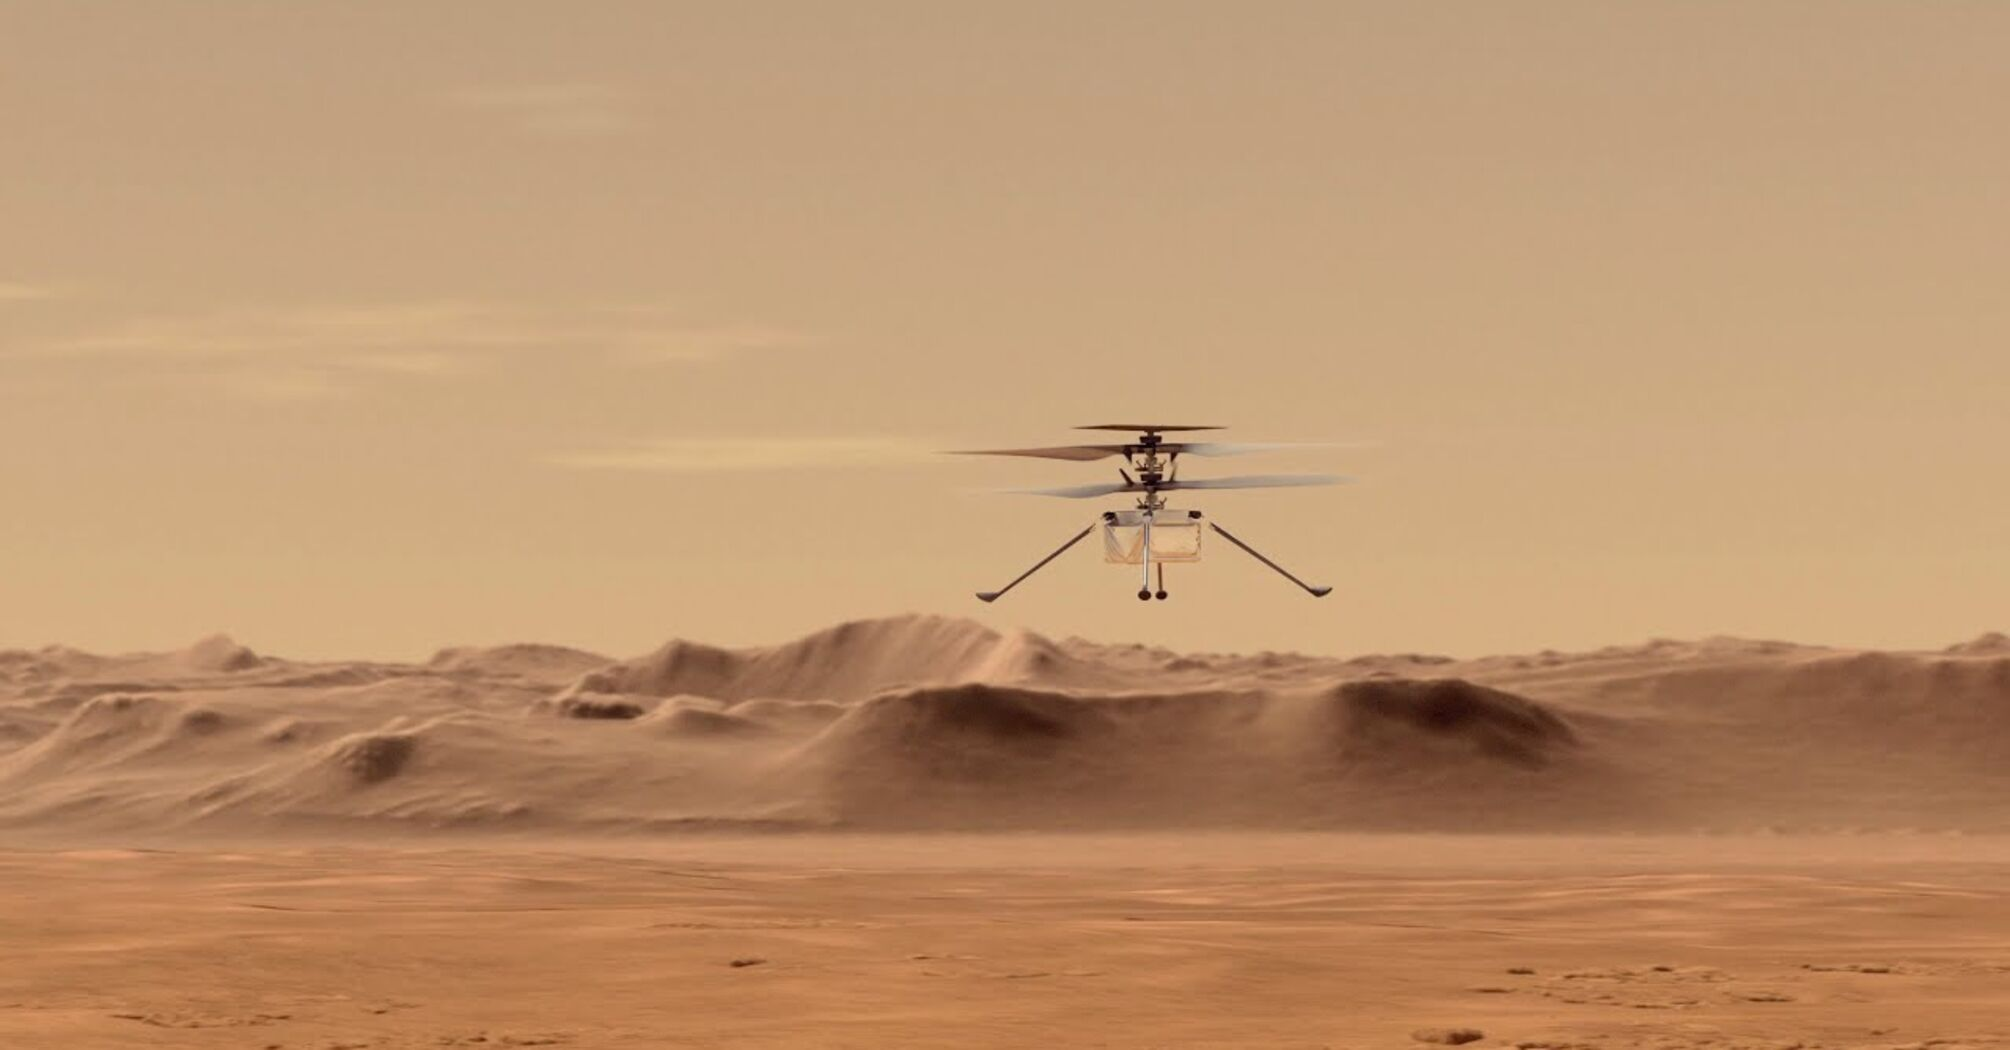 Вертолёт-дрон Ingenuity успешно совершил 9-й полёт над поверхностью Марса